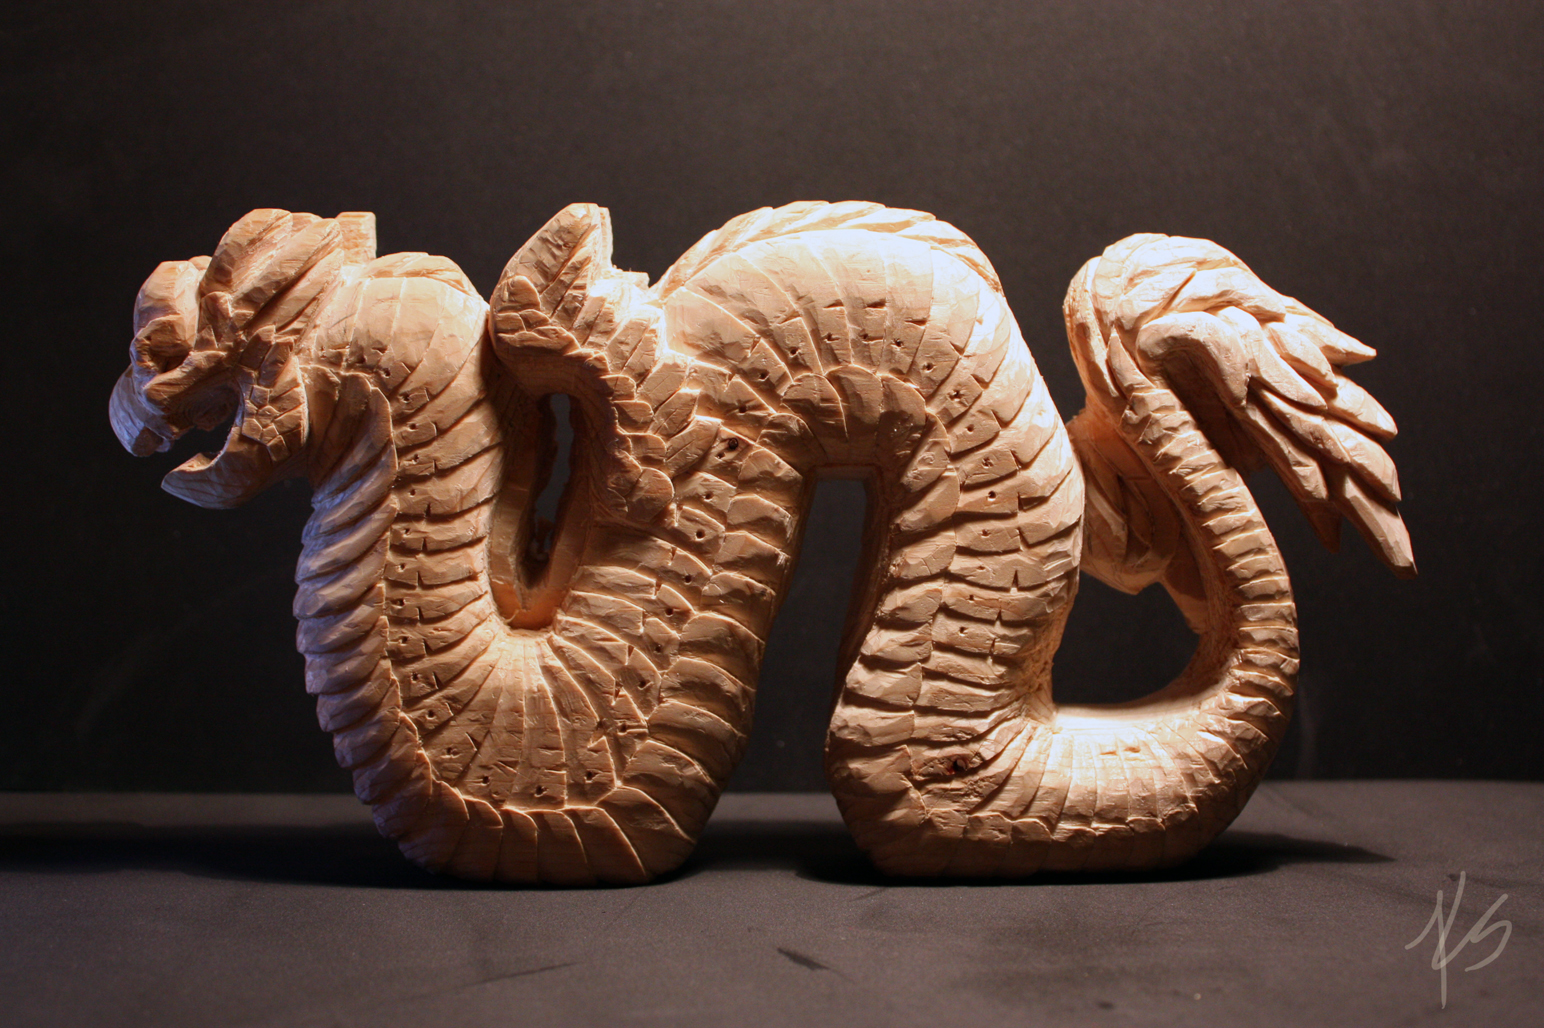 Carved Wooden Serpent by DargonXKS